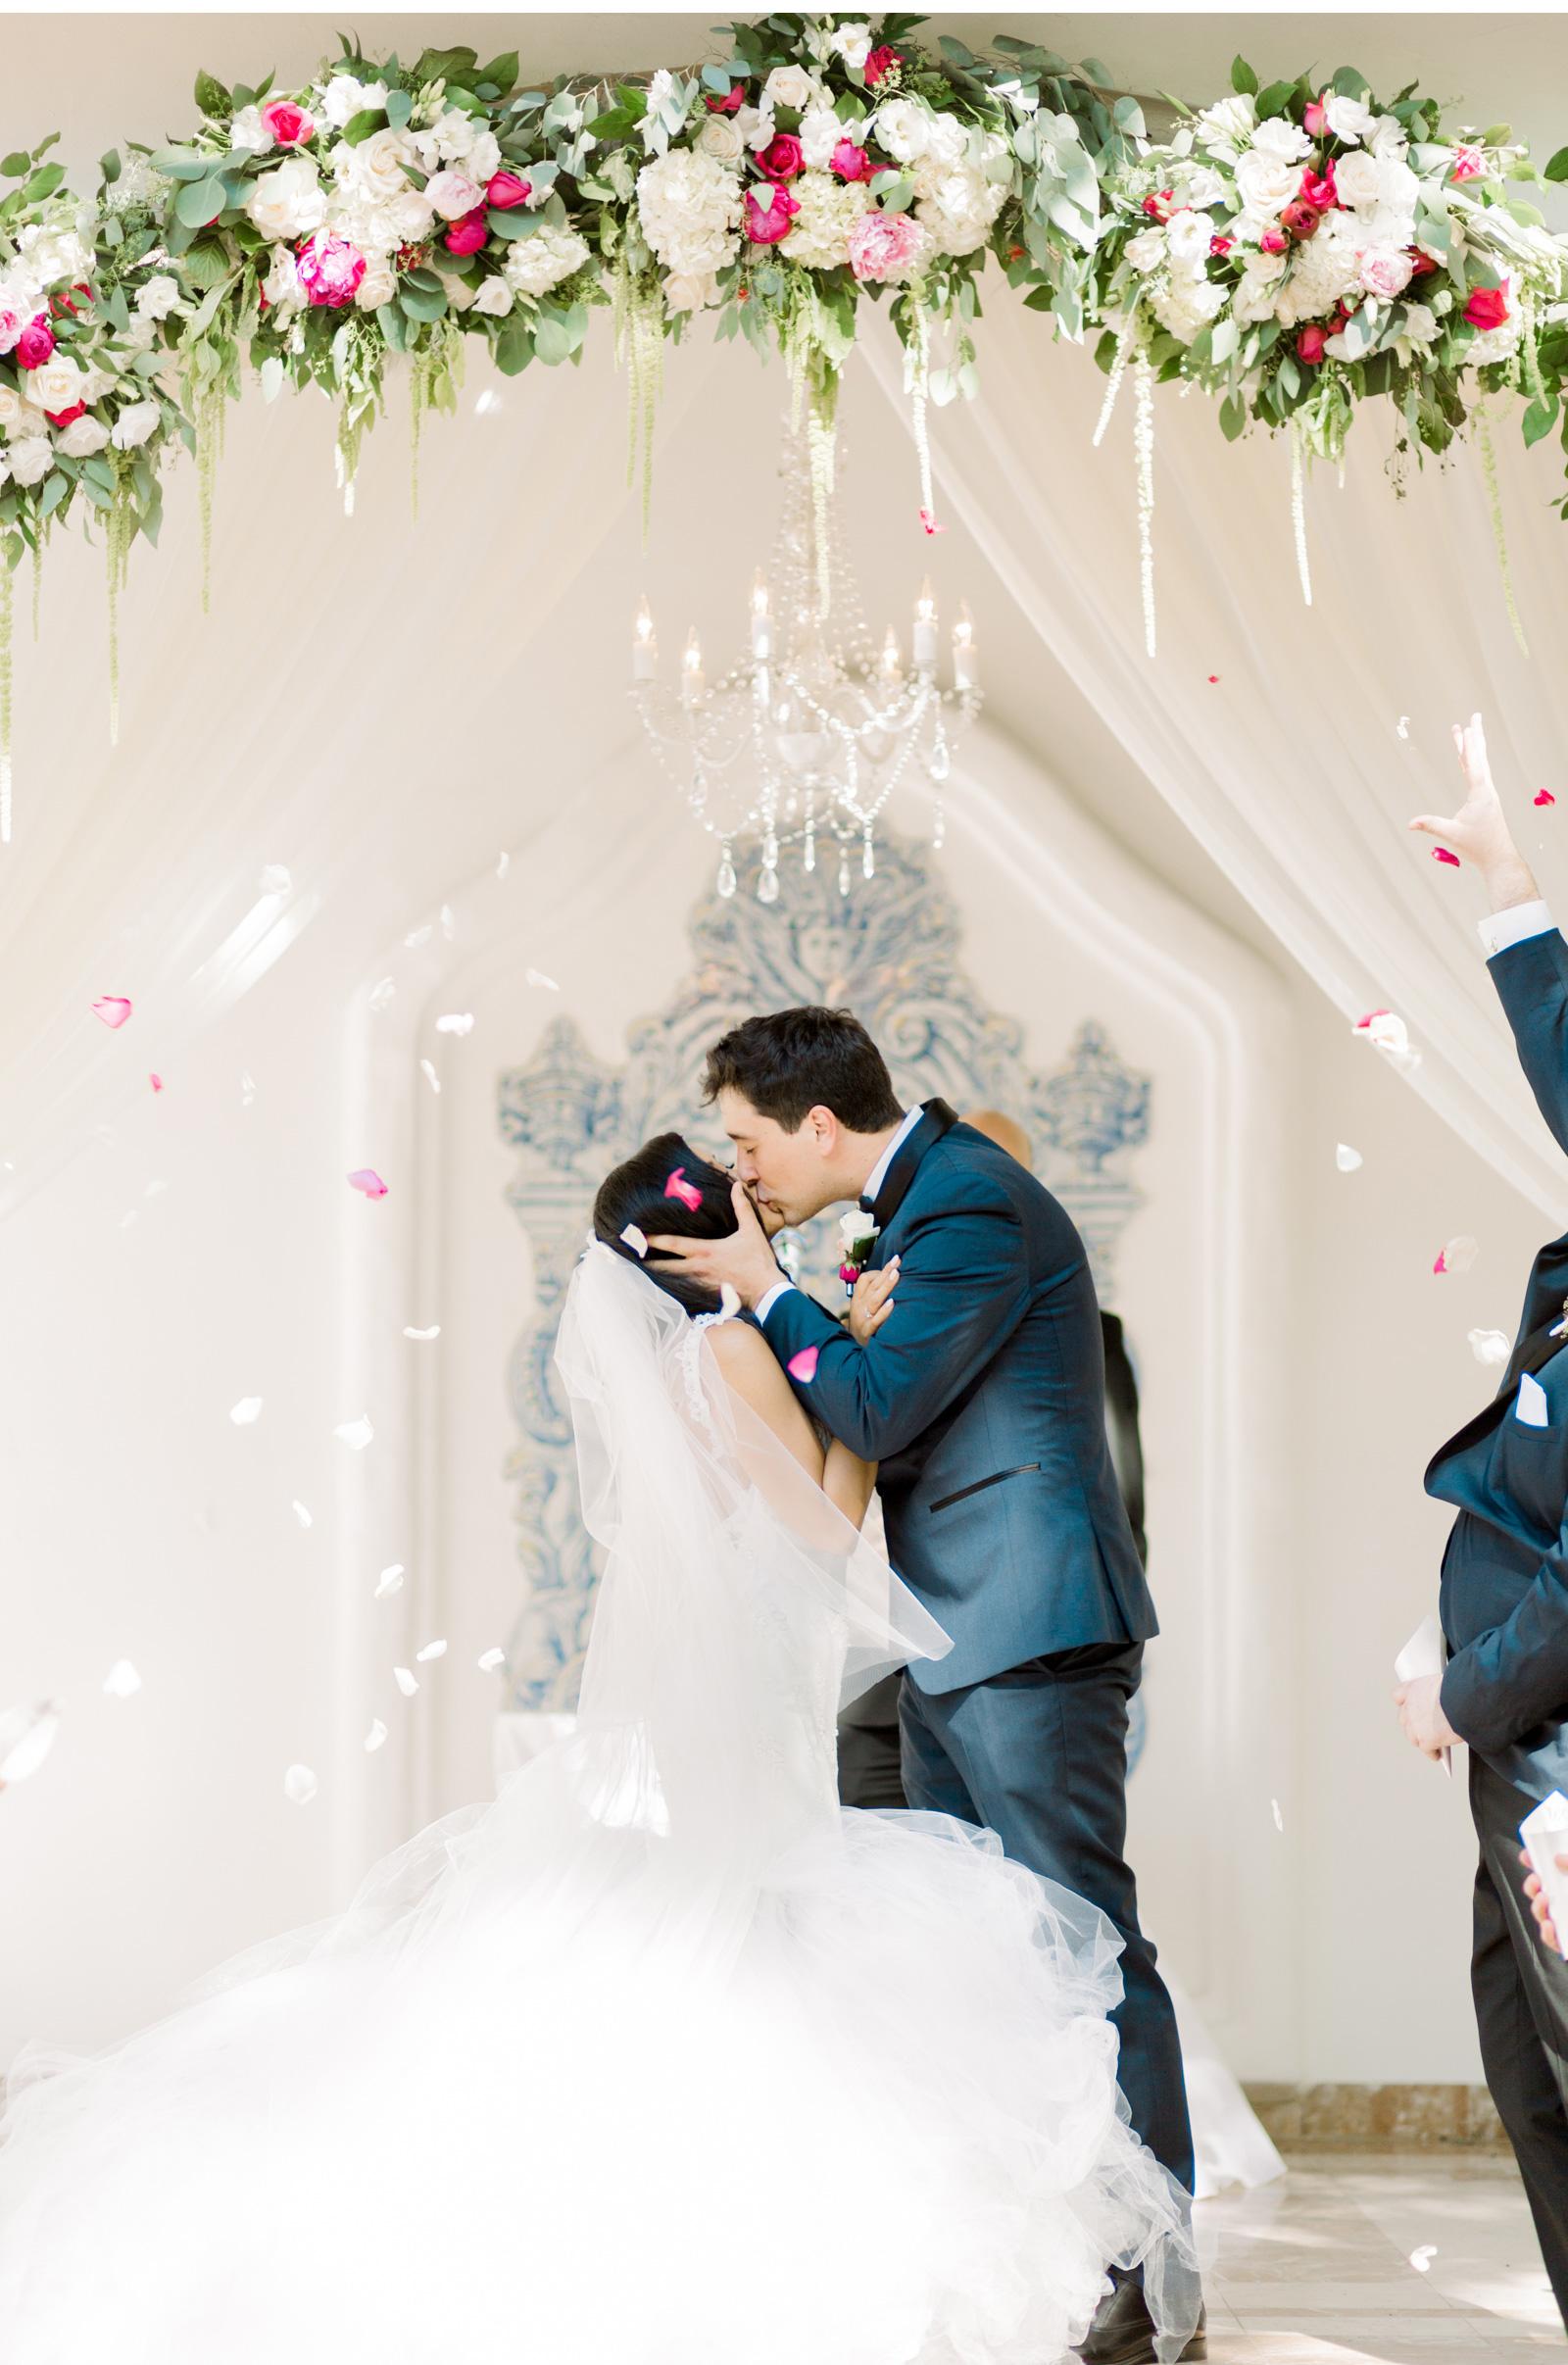 Malibu-Wedding-Triunfo-Creek-Natalie-Schutt-Photography_04.jpg